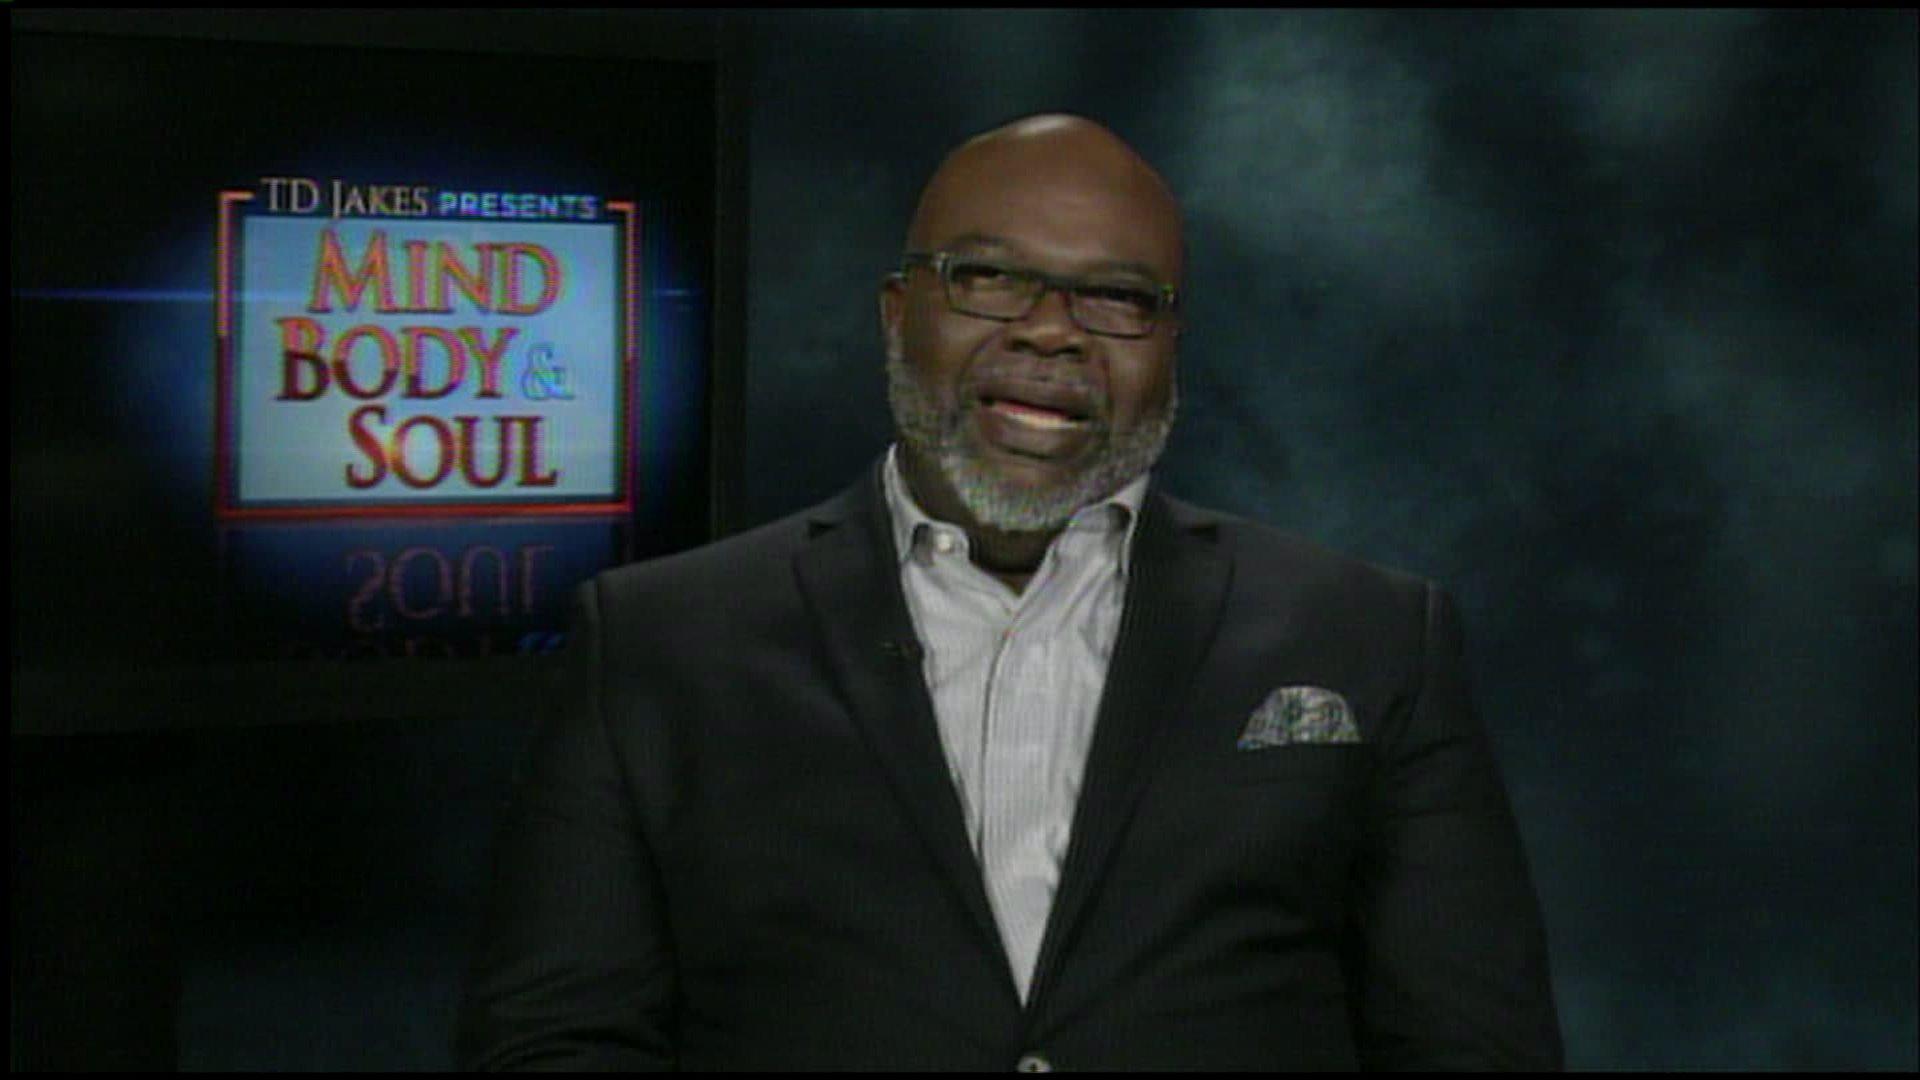 td jakes new talk show on bet